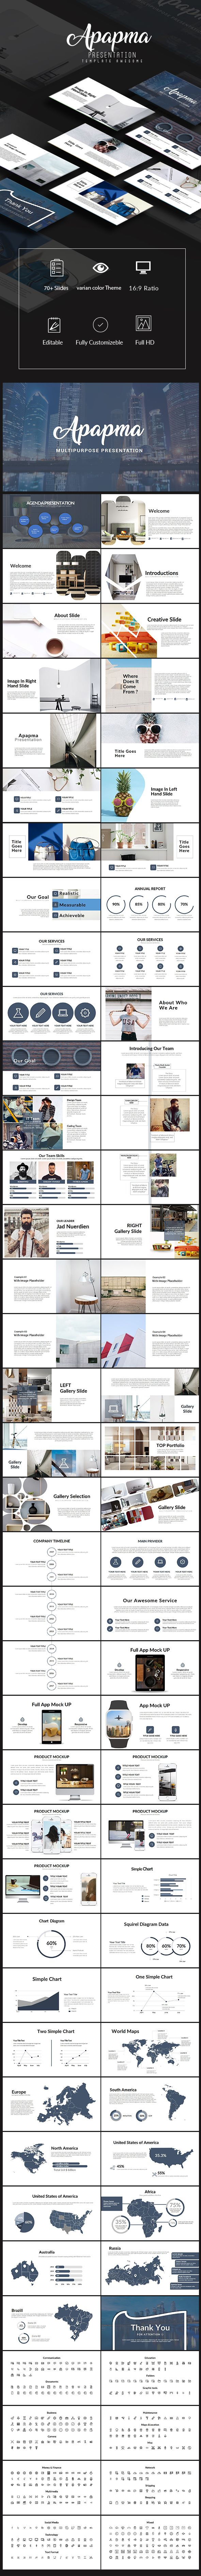 758 best PowerPoint images on Pinterest | Presentation templates ...